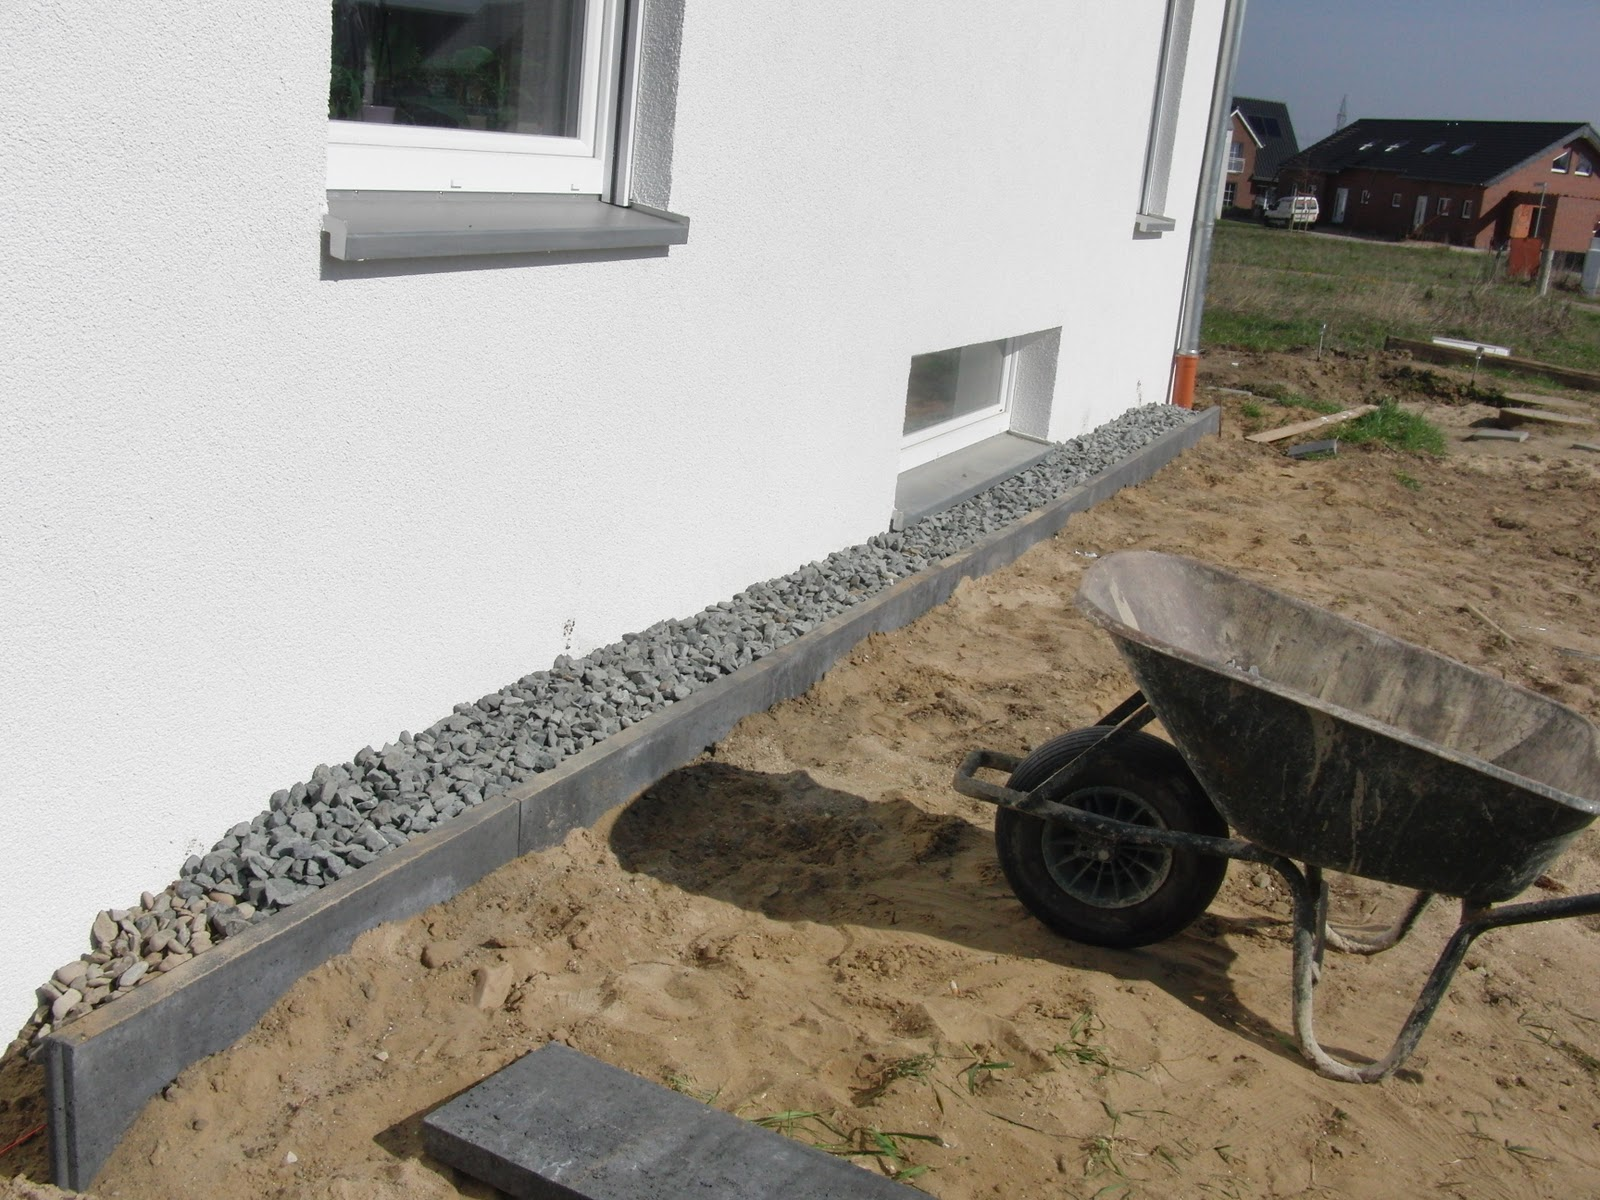 Drainage Ums Haus drainage ums haus zk82 hitoiro